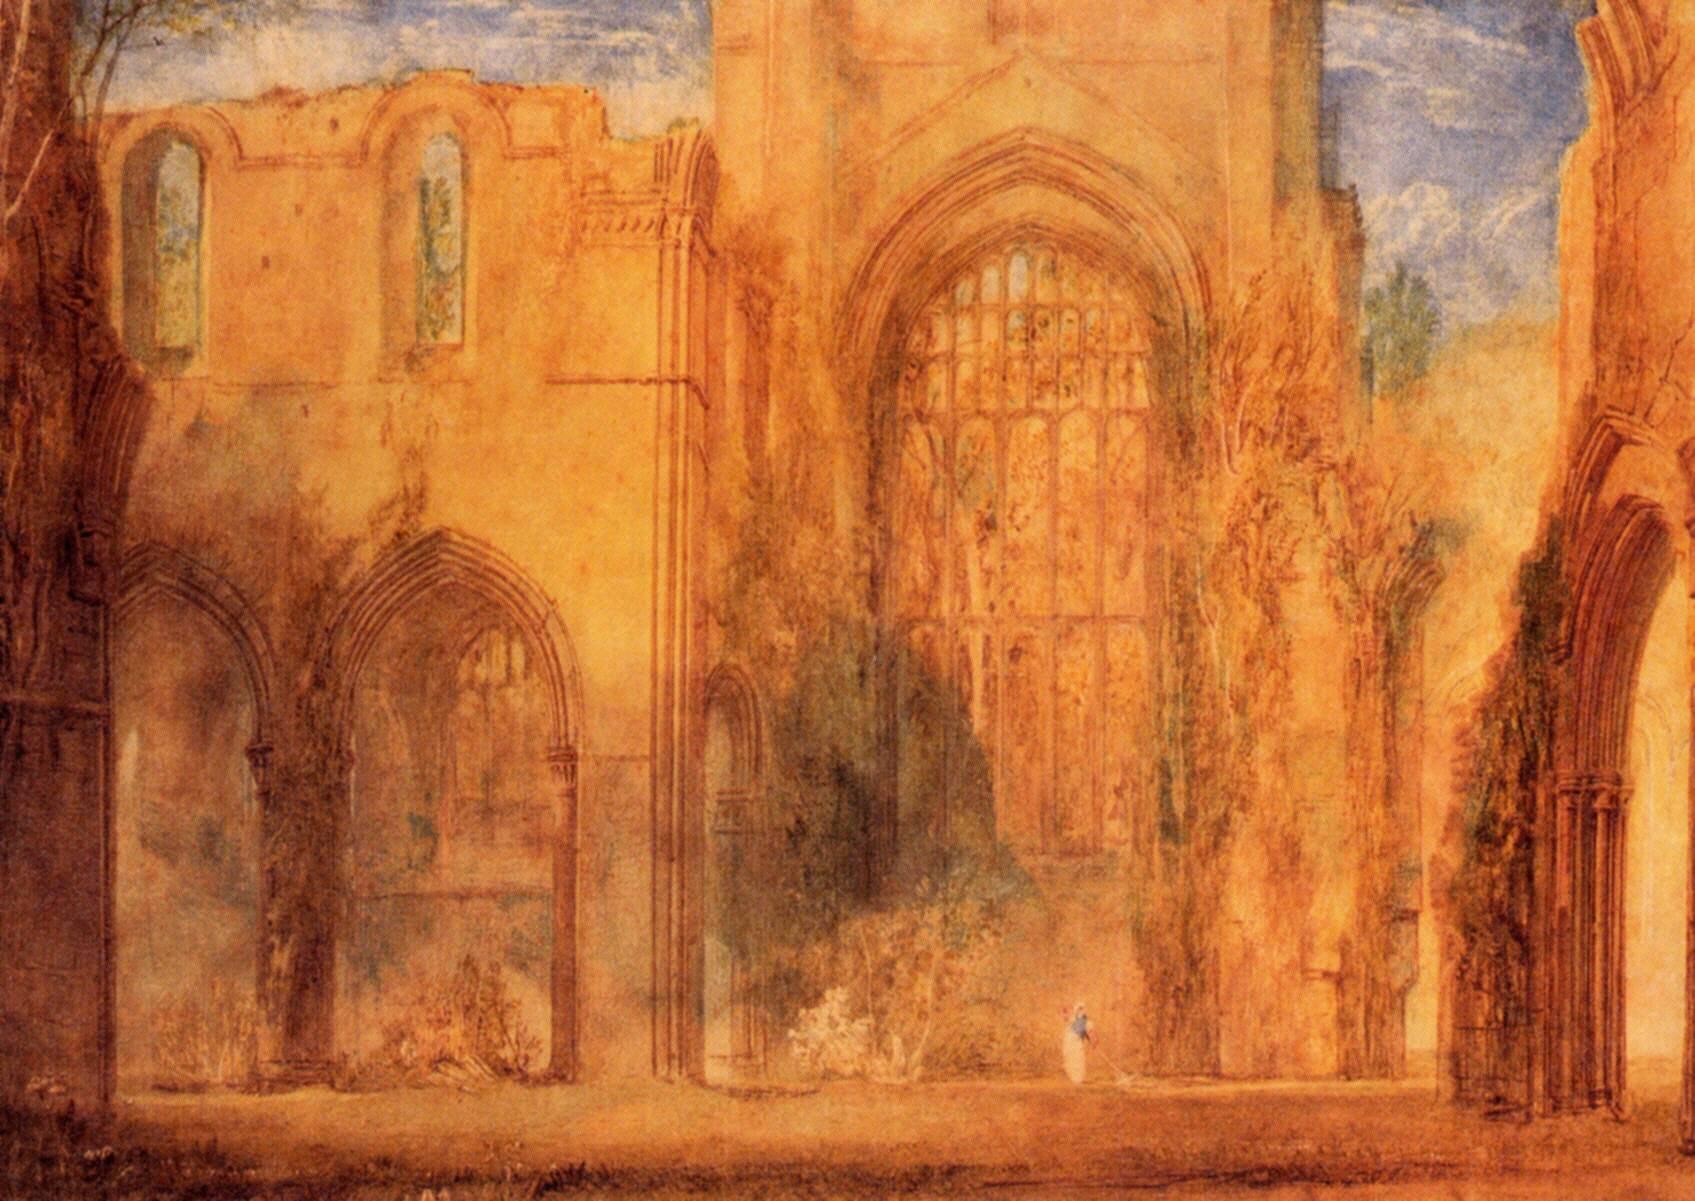 картина Аббатство в Йоркшире :: Уильям Тёрнер - William Turner фото